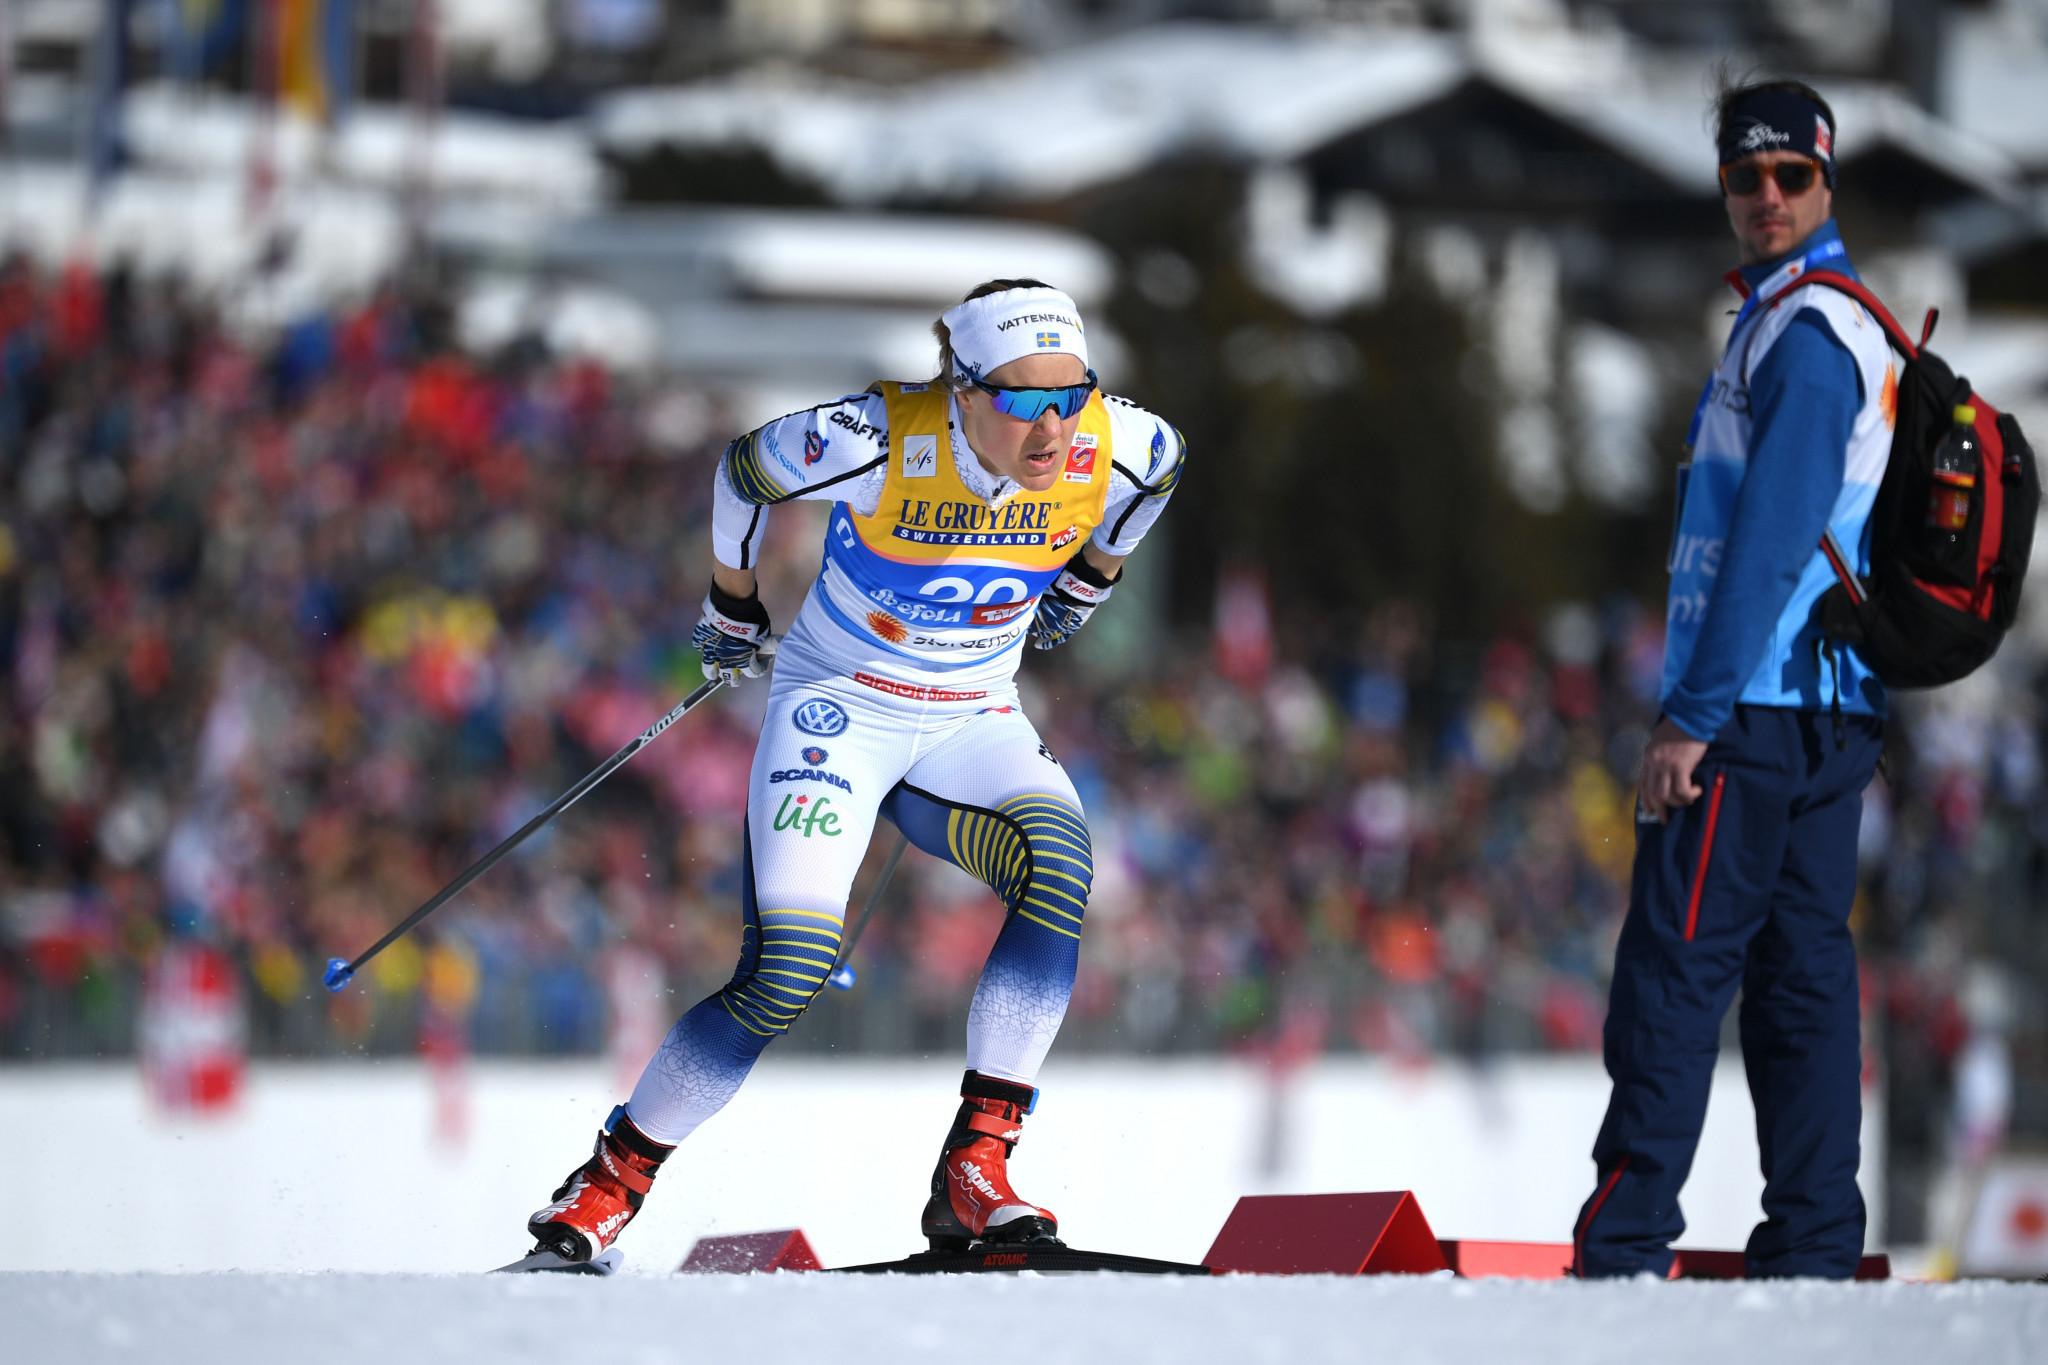 Swedish cross-country skier Falk announces retirement